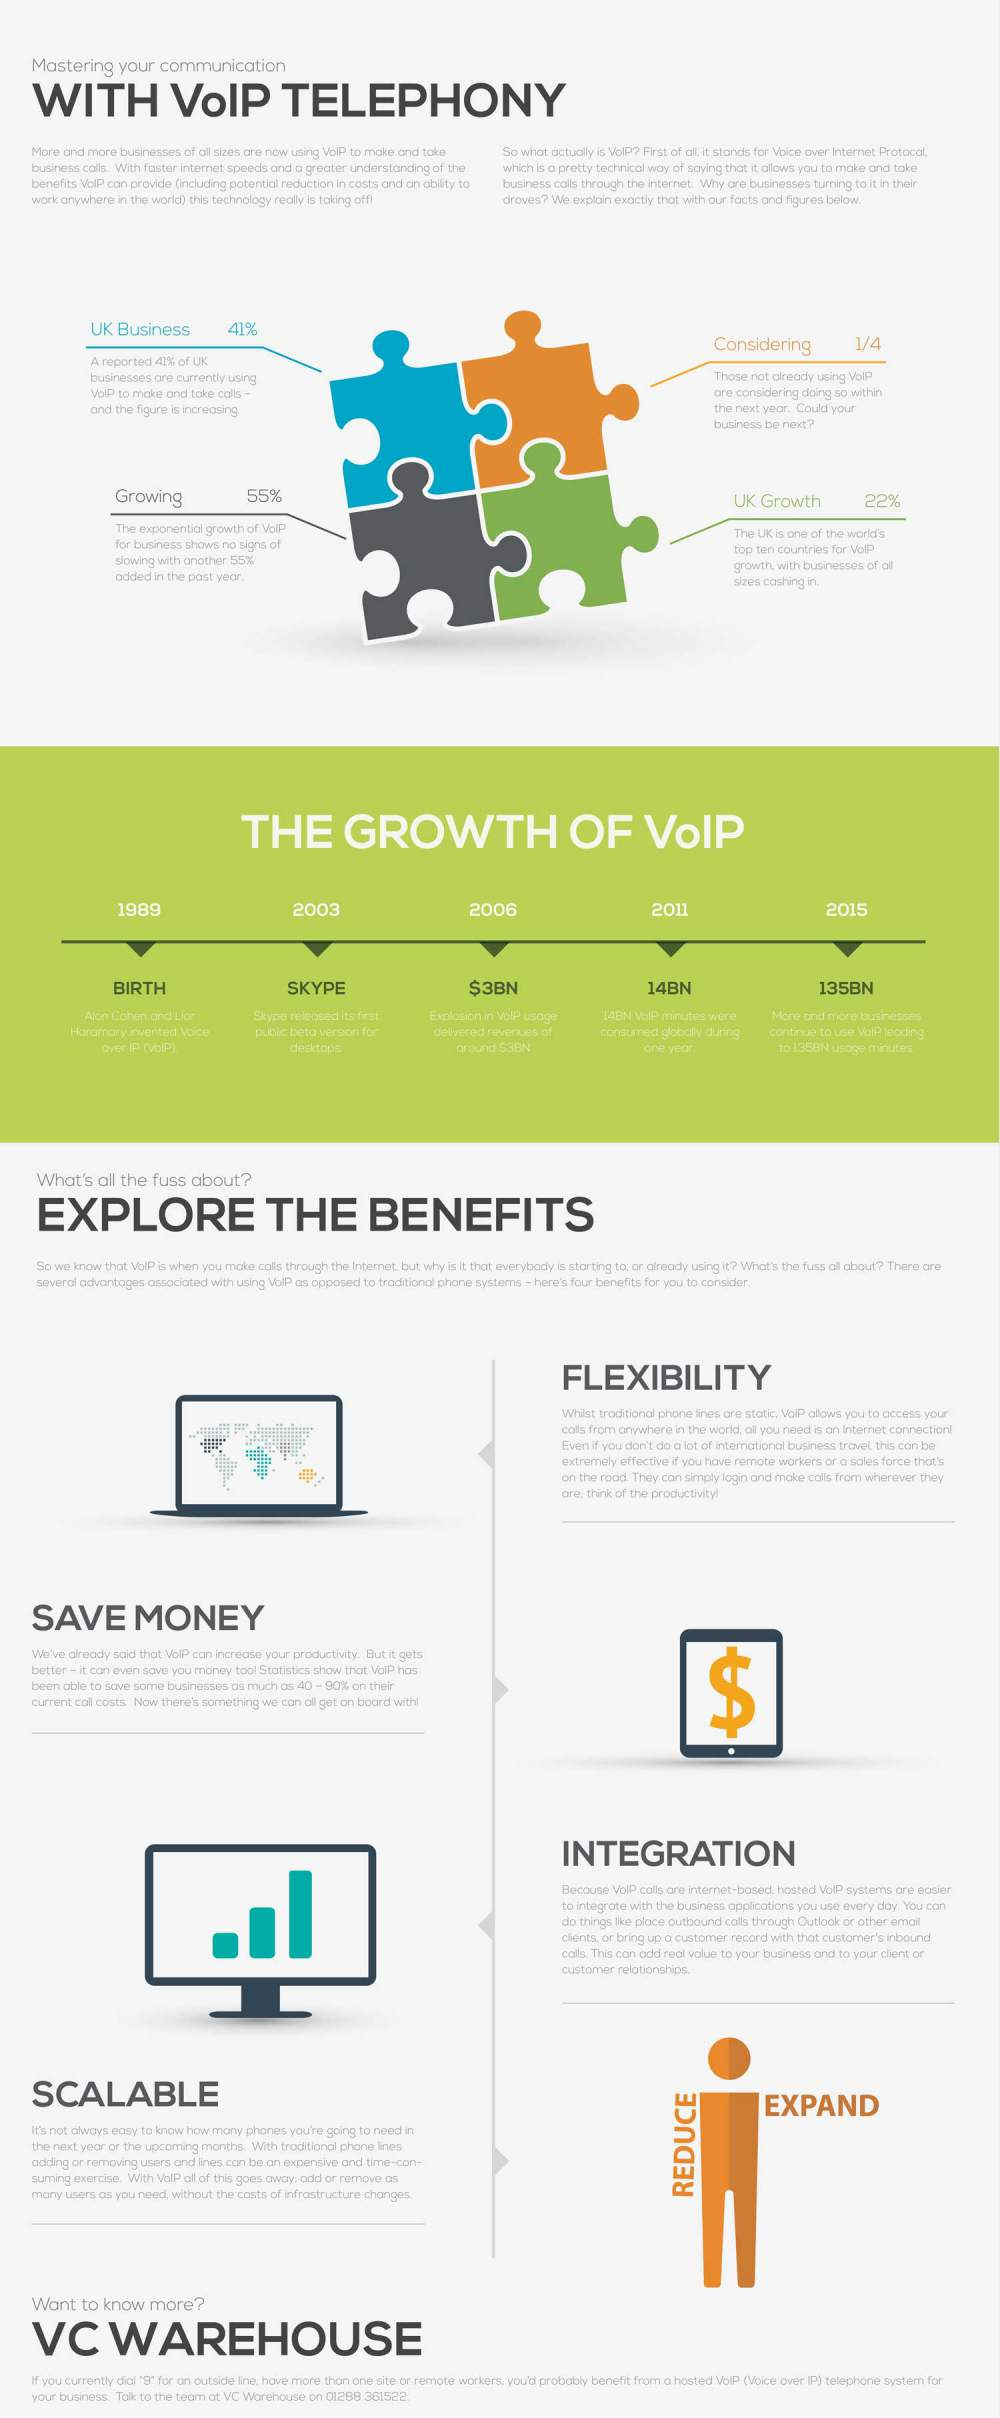 Benefits of VoIP Telephony